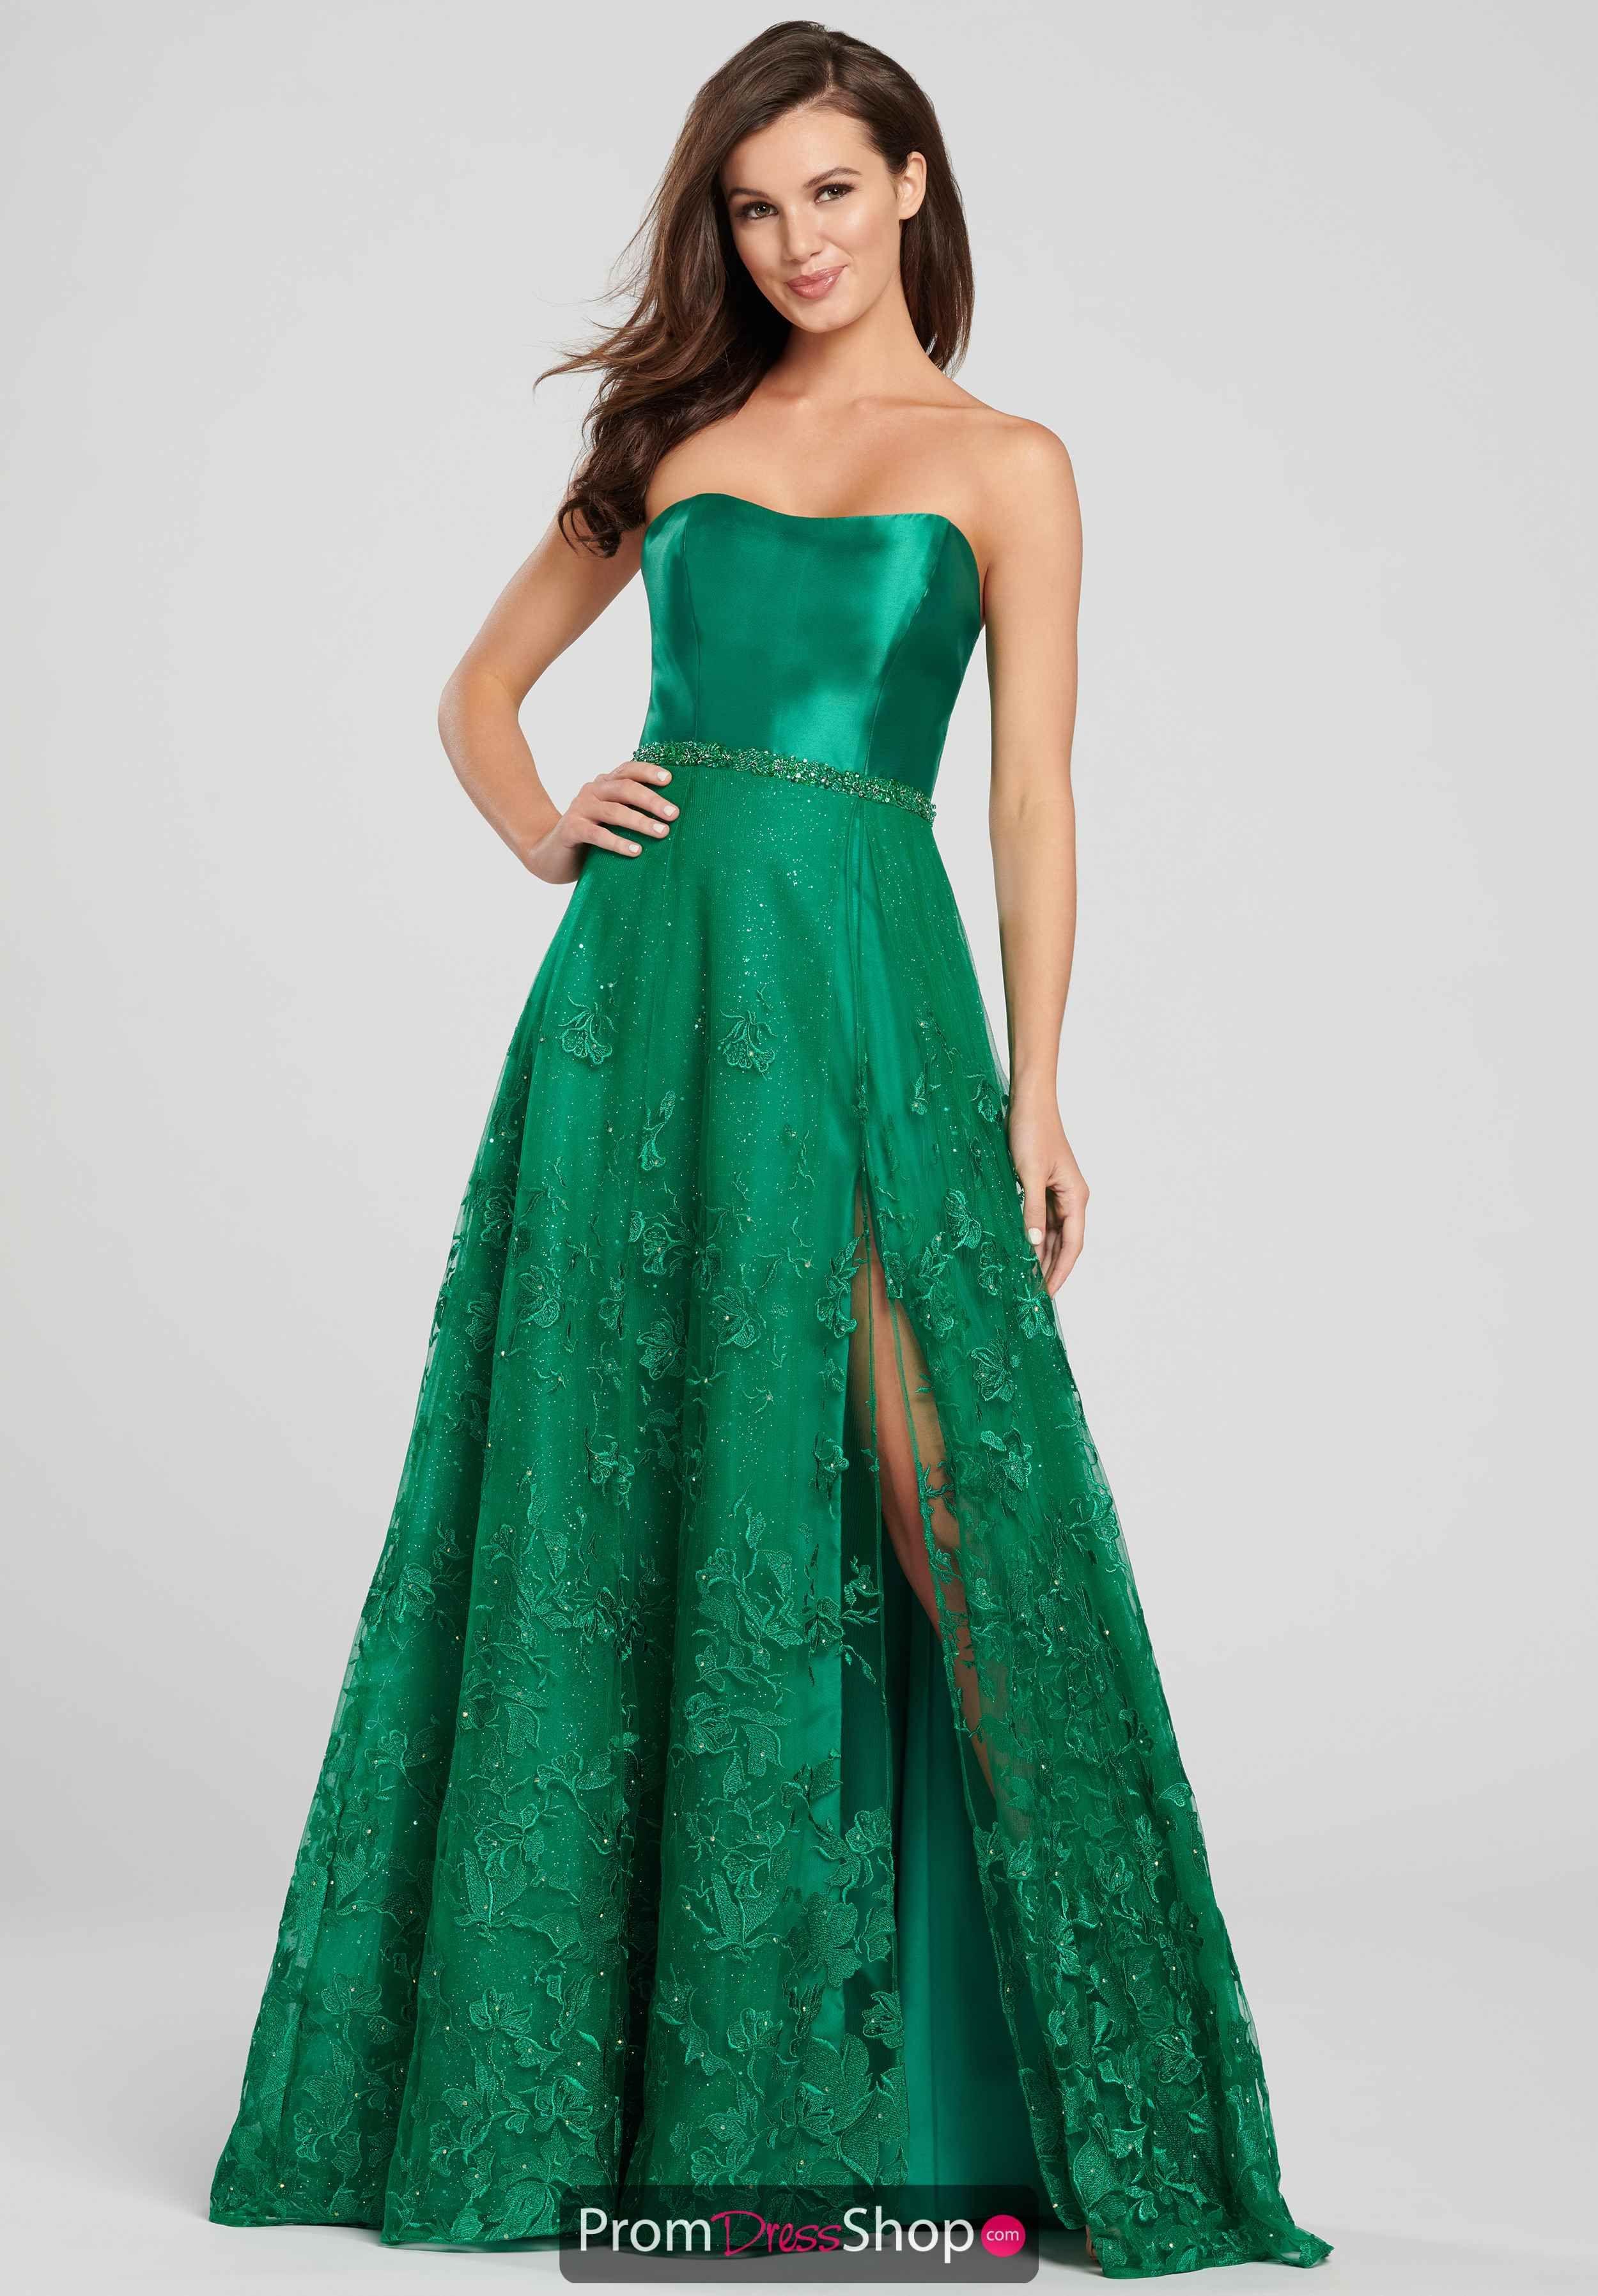 a69c83453f2 Emerald Plus Size Prom Dresses